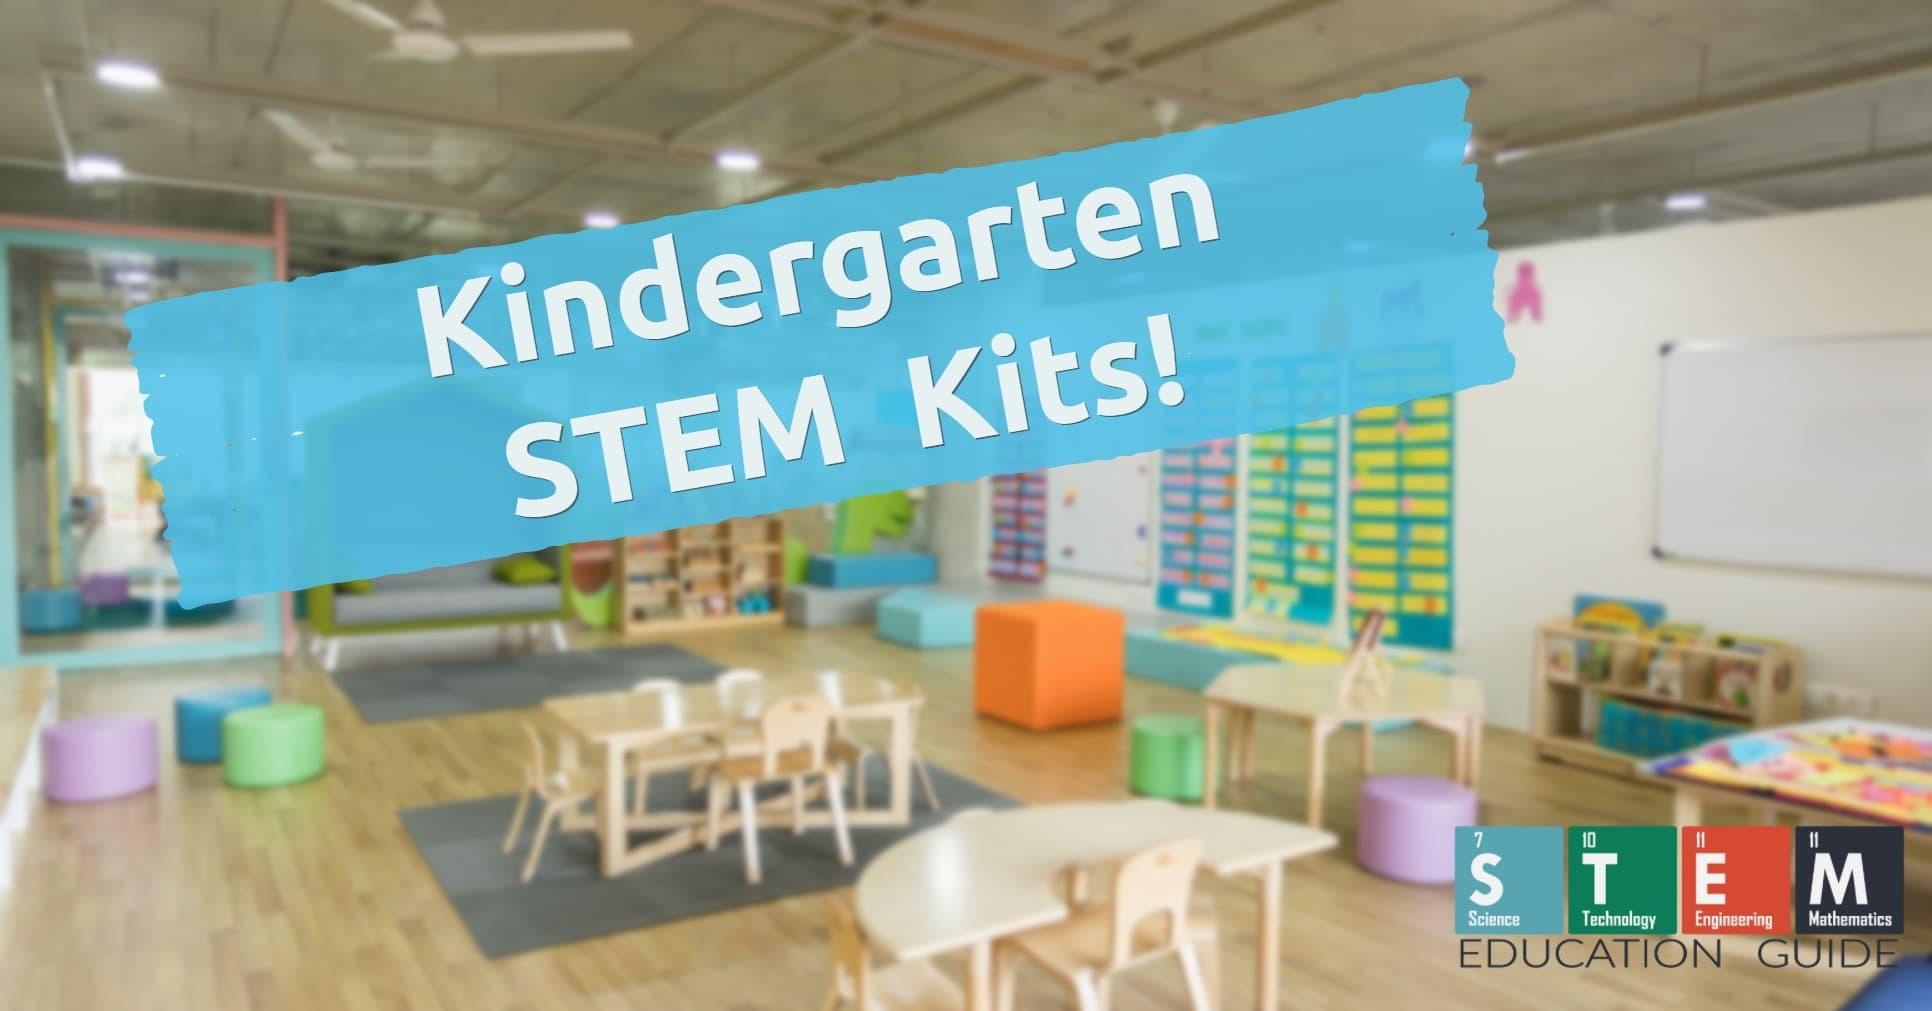 Kindergarten STEM Kits for Your Children to Improve Their STEM Skills